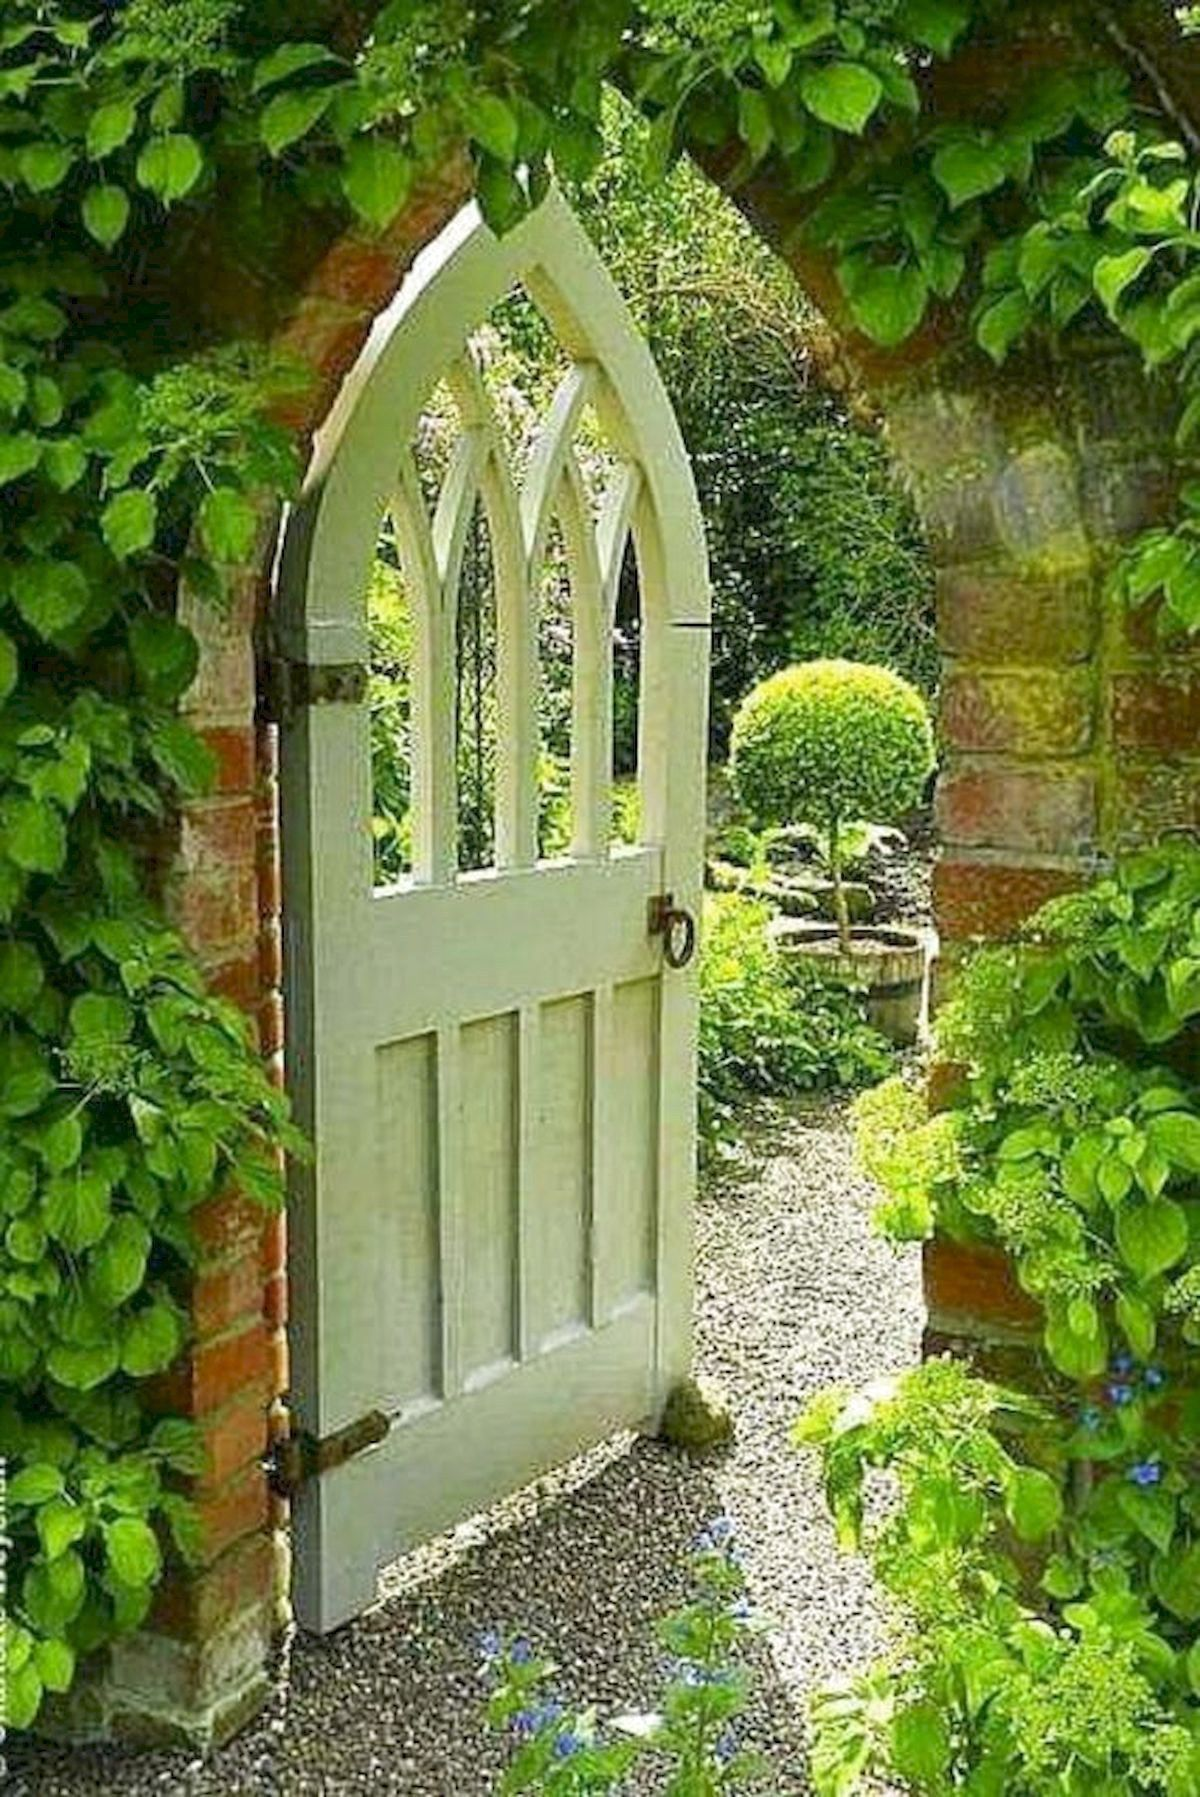 77 Favourite Pinterest Garden Decor Ideas Garden Gates